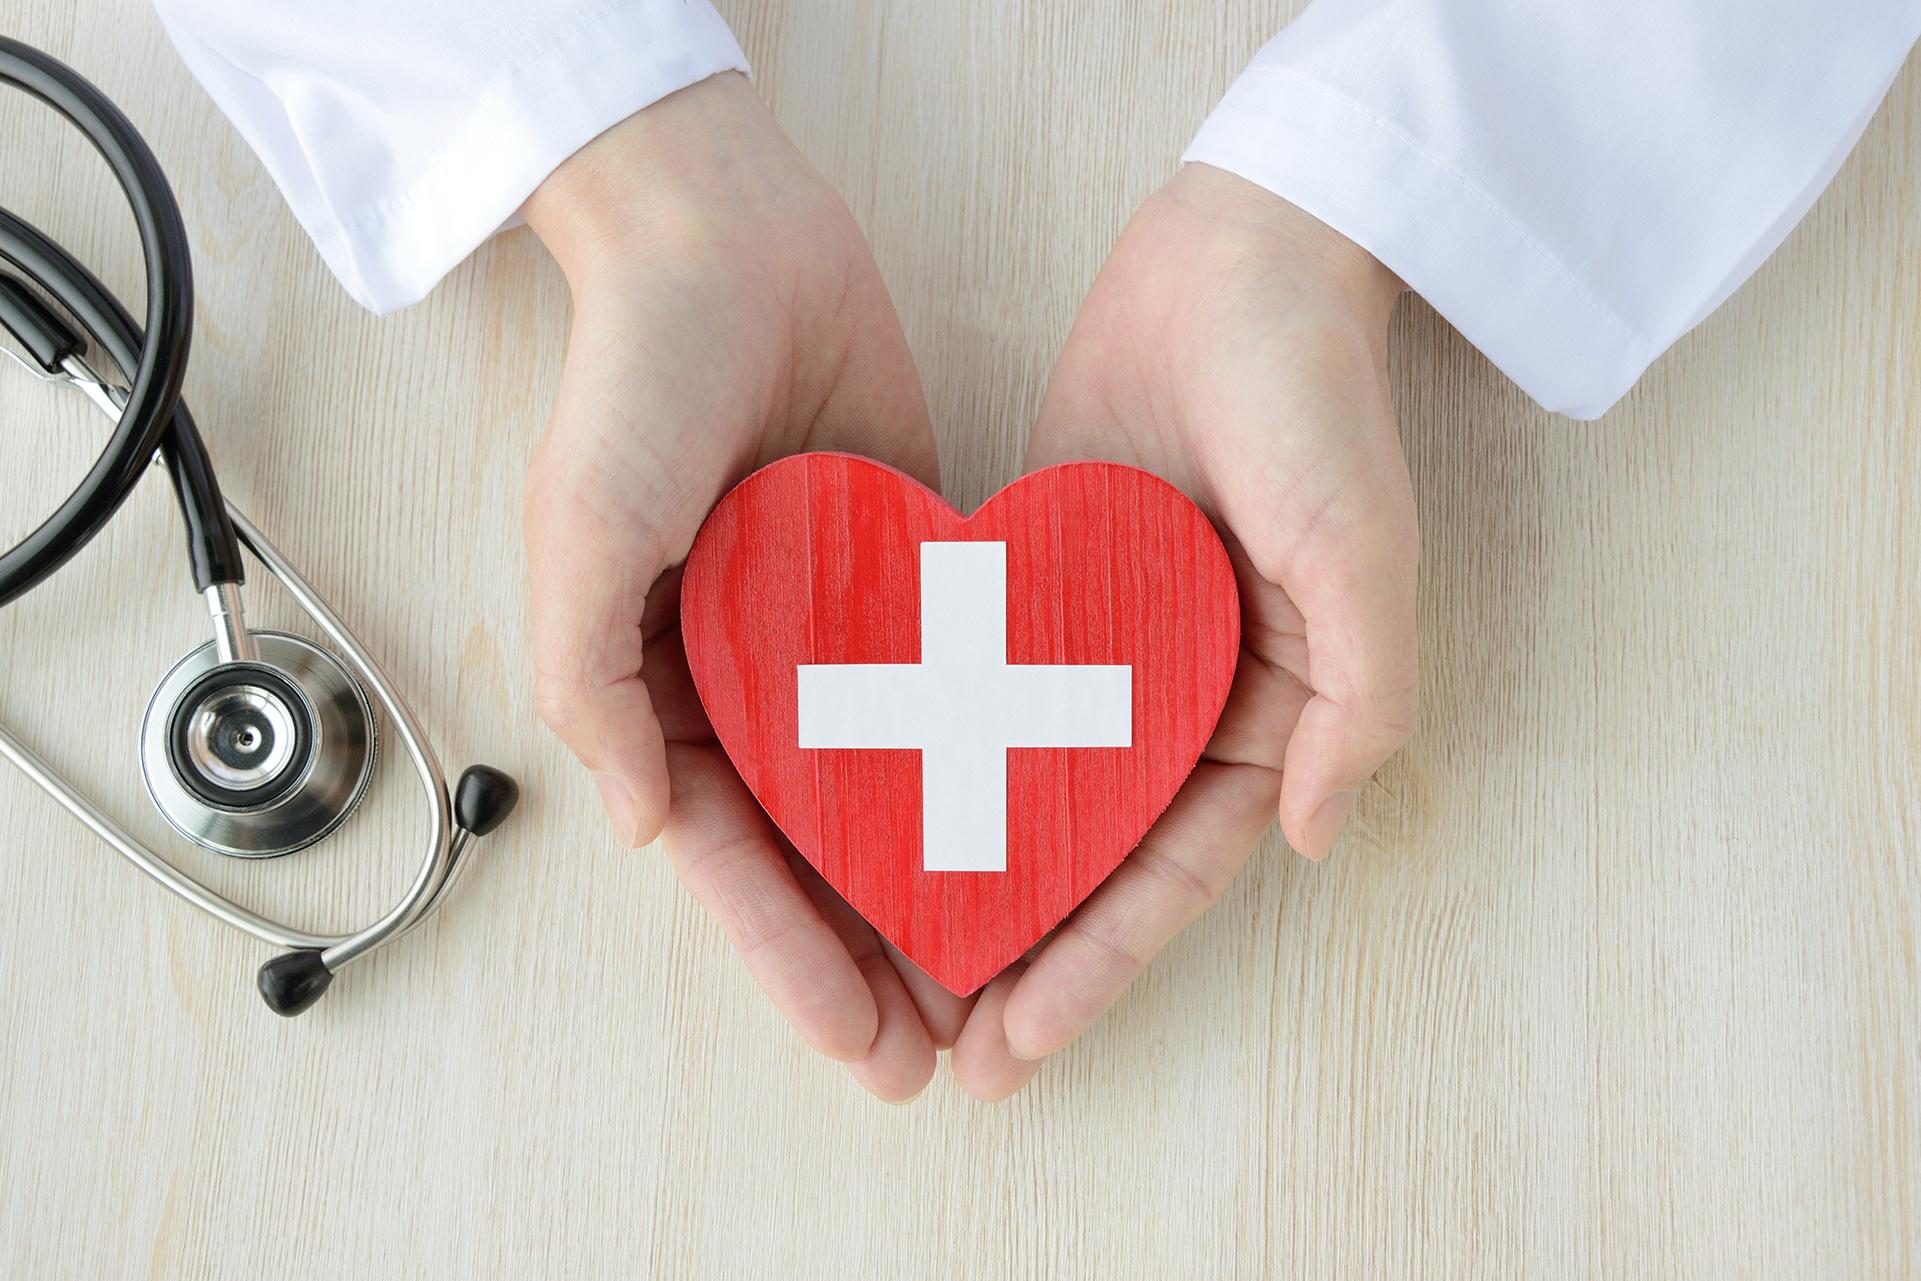 Bakterier i munden kan føre til hjertekarsygdomme